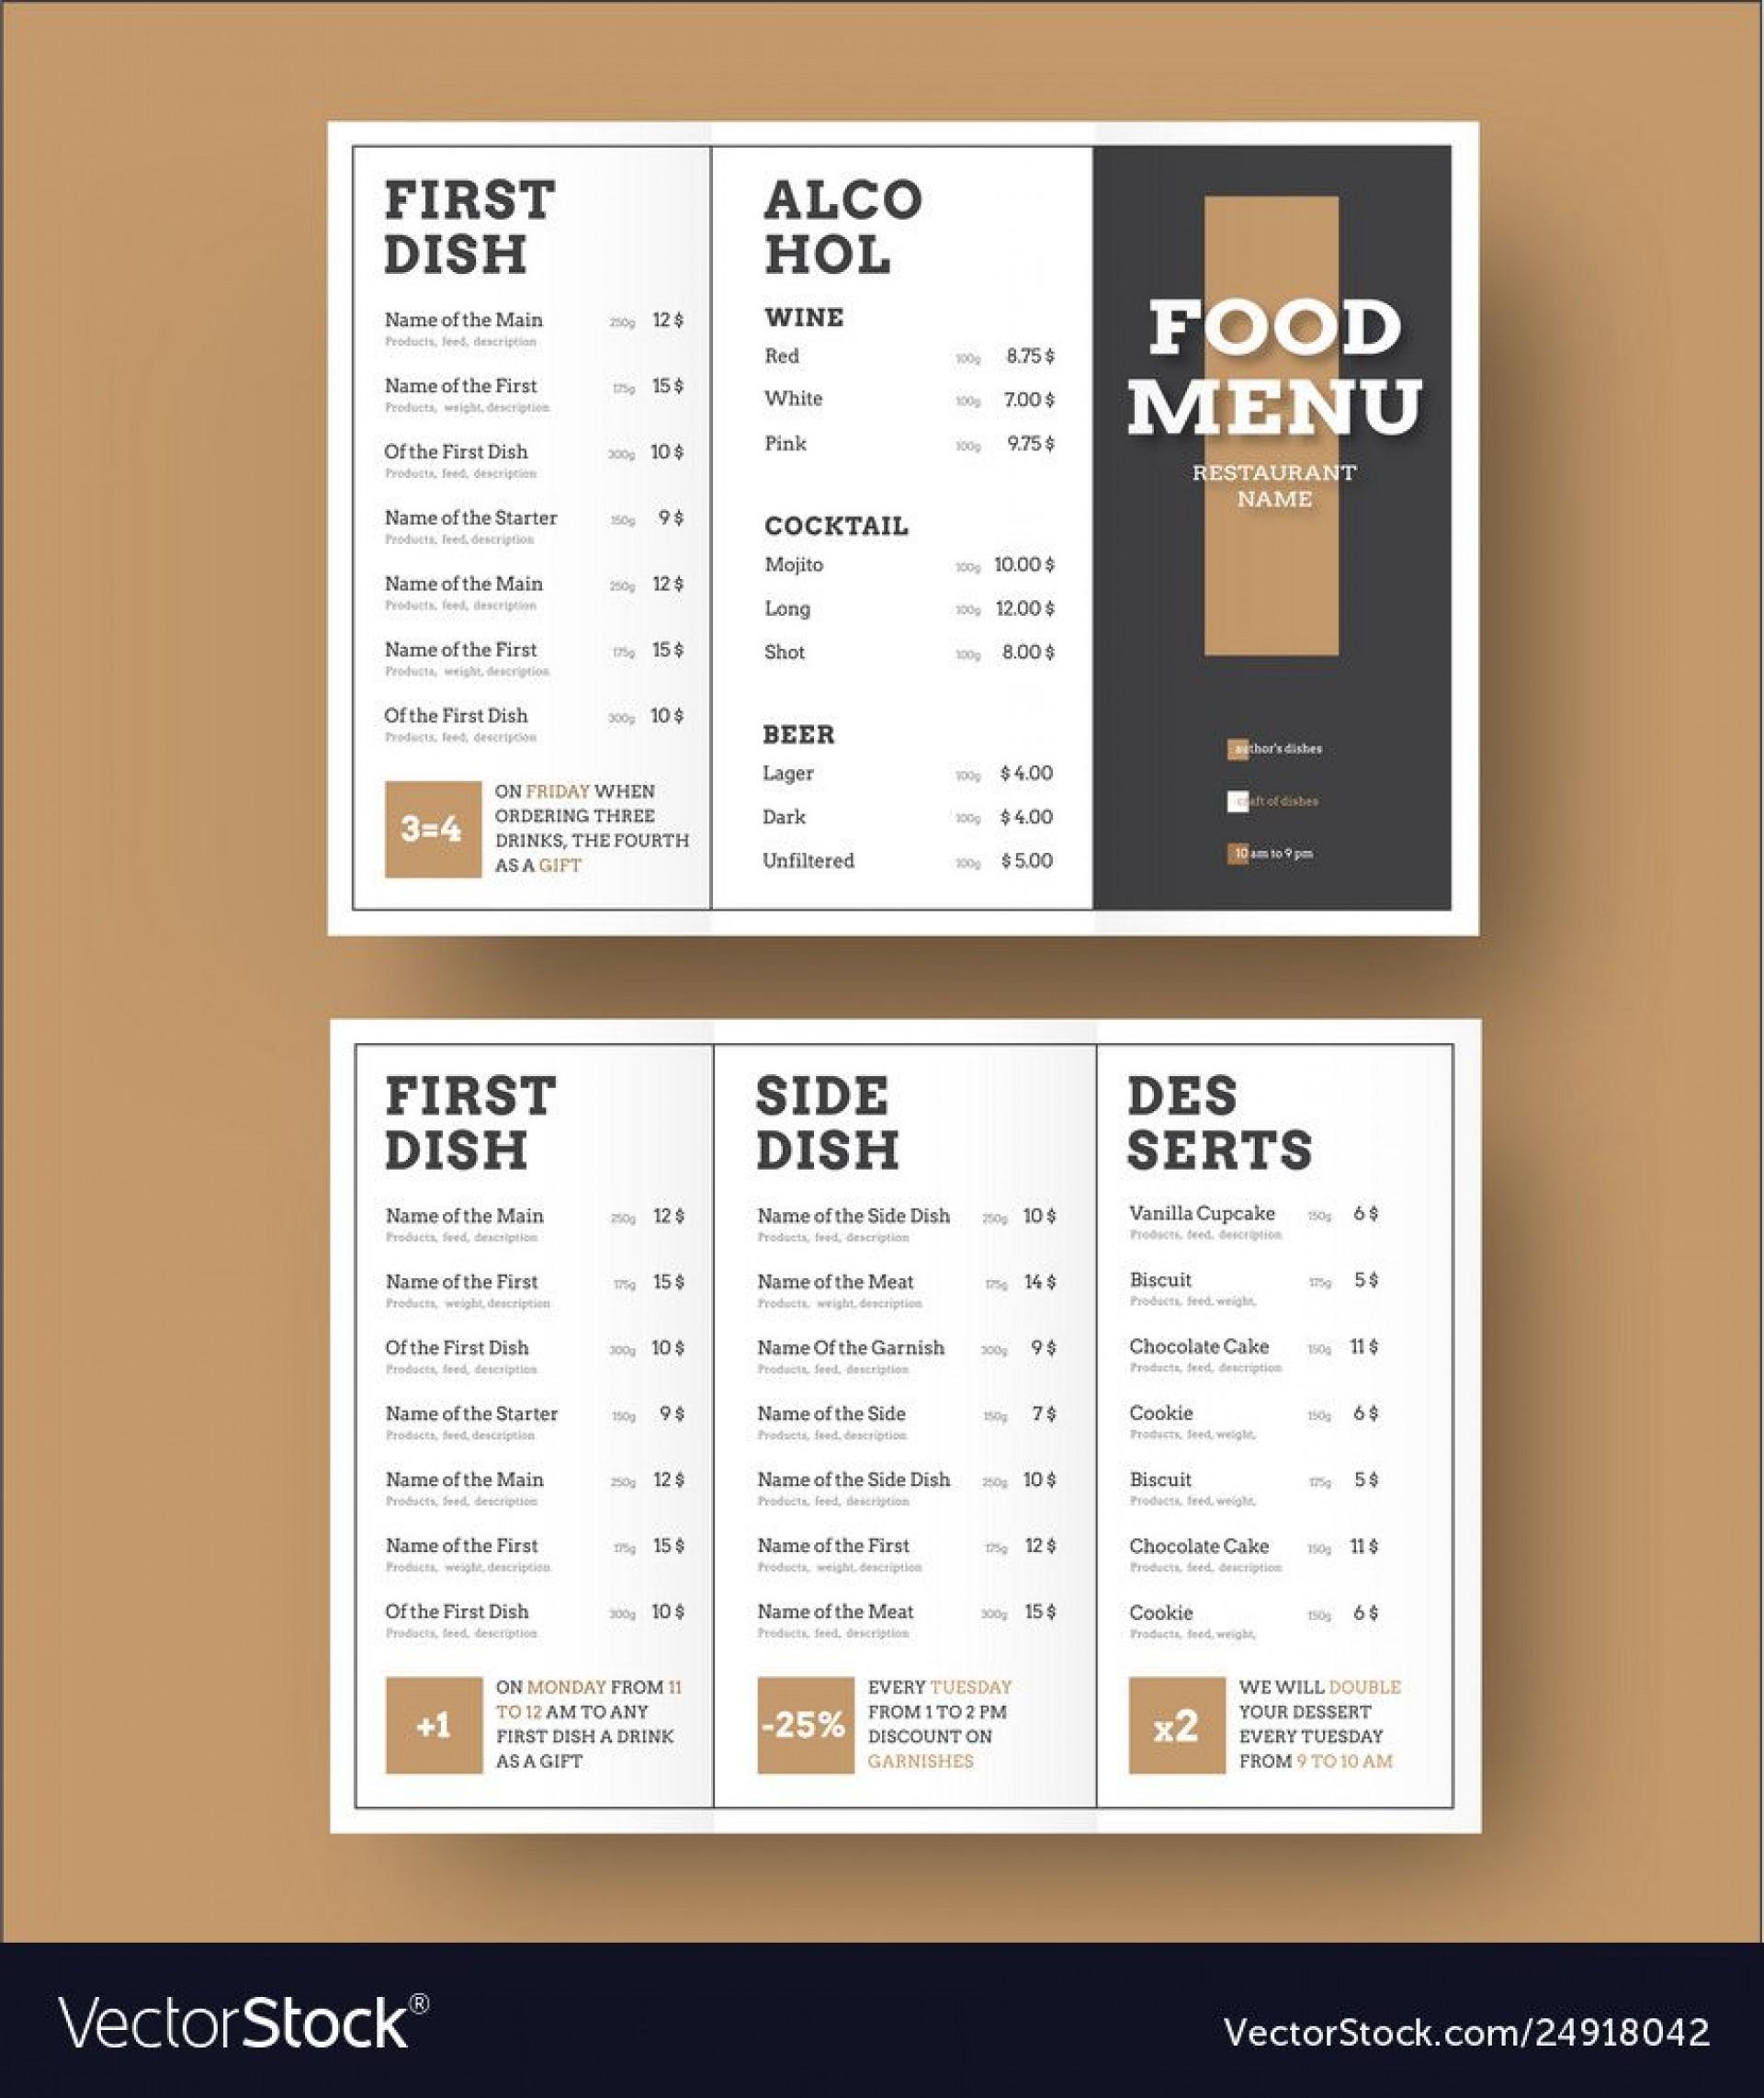 008 Singular Tri Fold Menu Template High Definition  Templates Restaurant Tri-fold Food Free Psd1920